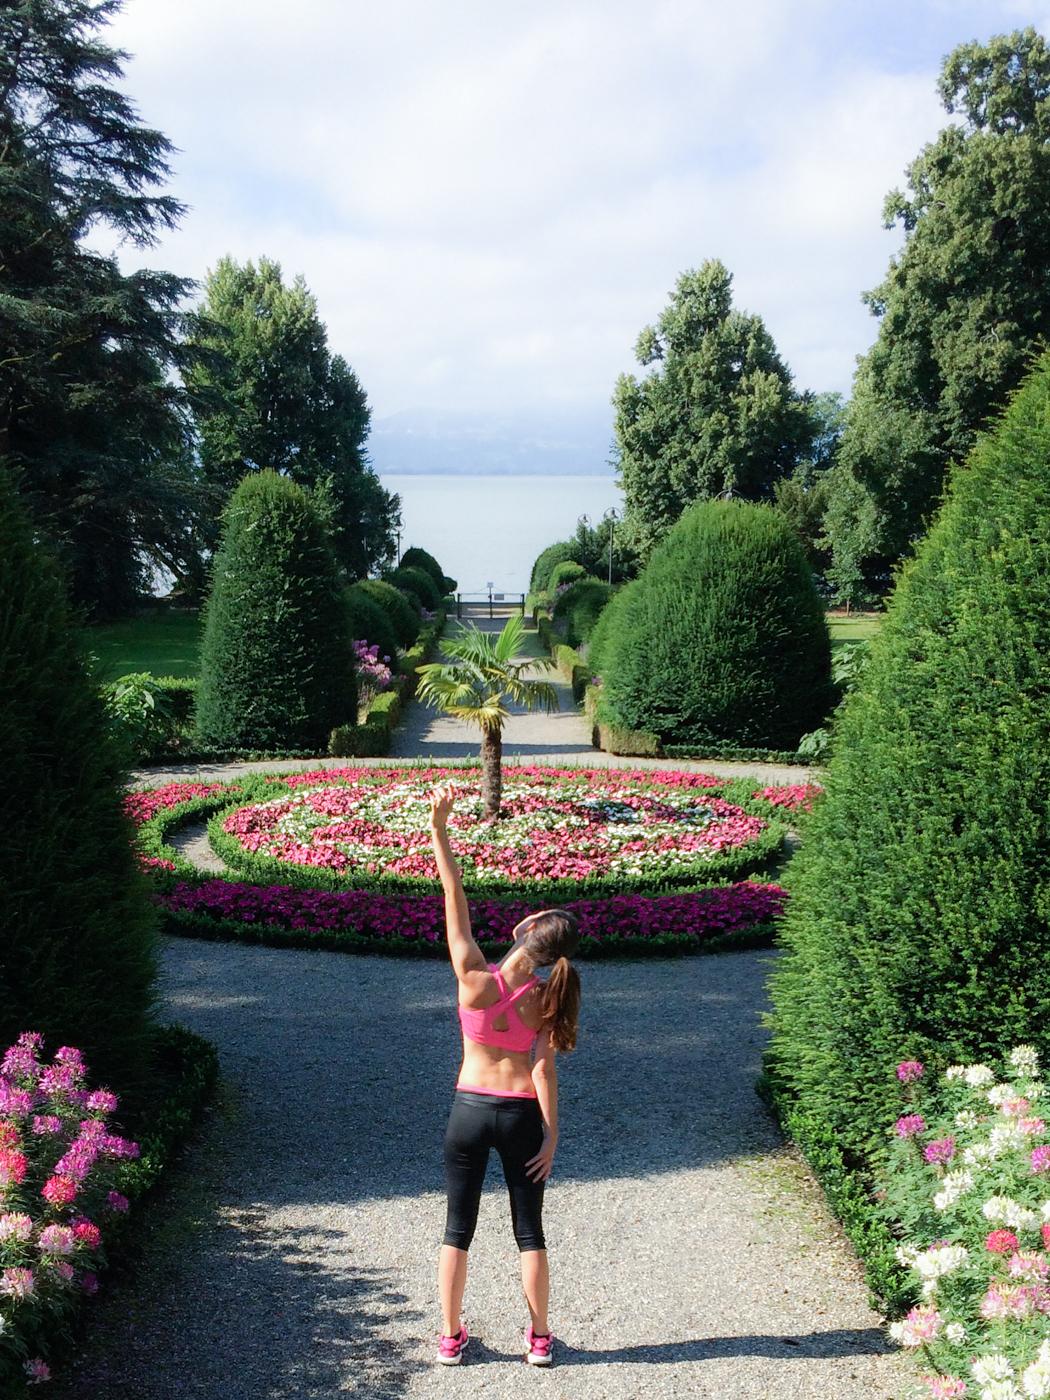 Lindarella-Linda-Urlaub-Bodensee-Travelblog-0106